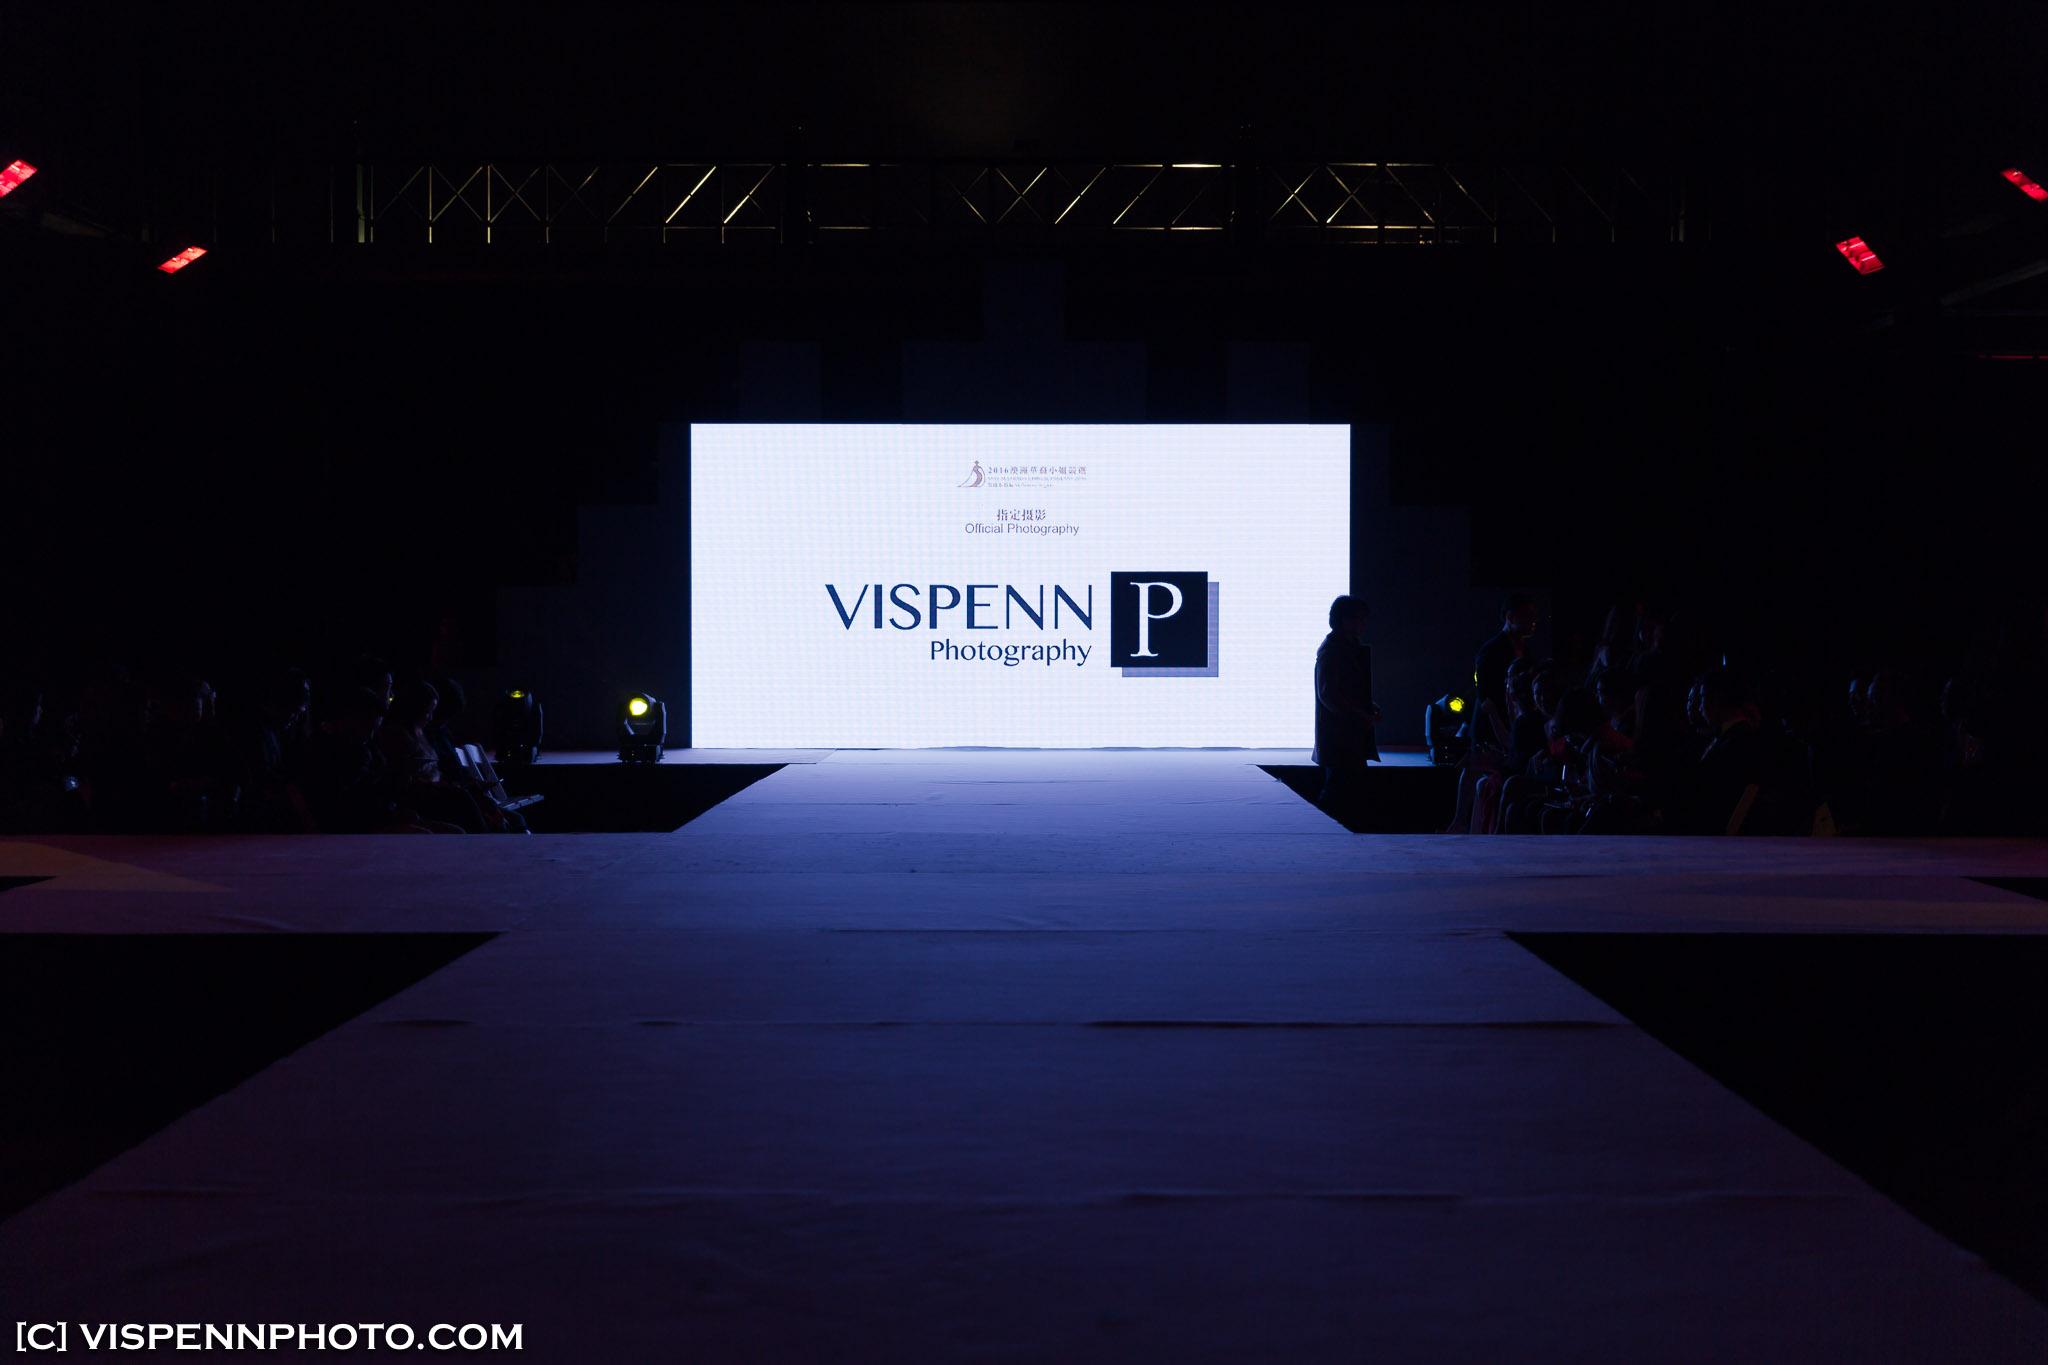 Melbourne Events Photography VISPENN 墨尔本 活动摄影 年会拍摄 VISPENN P 02392